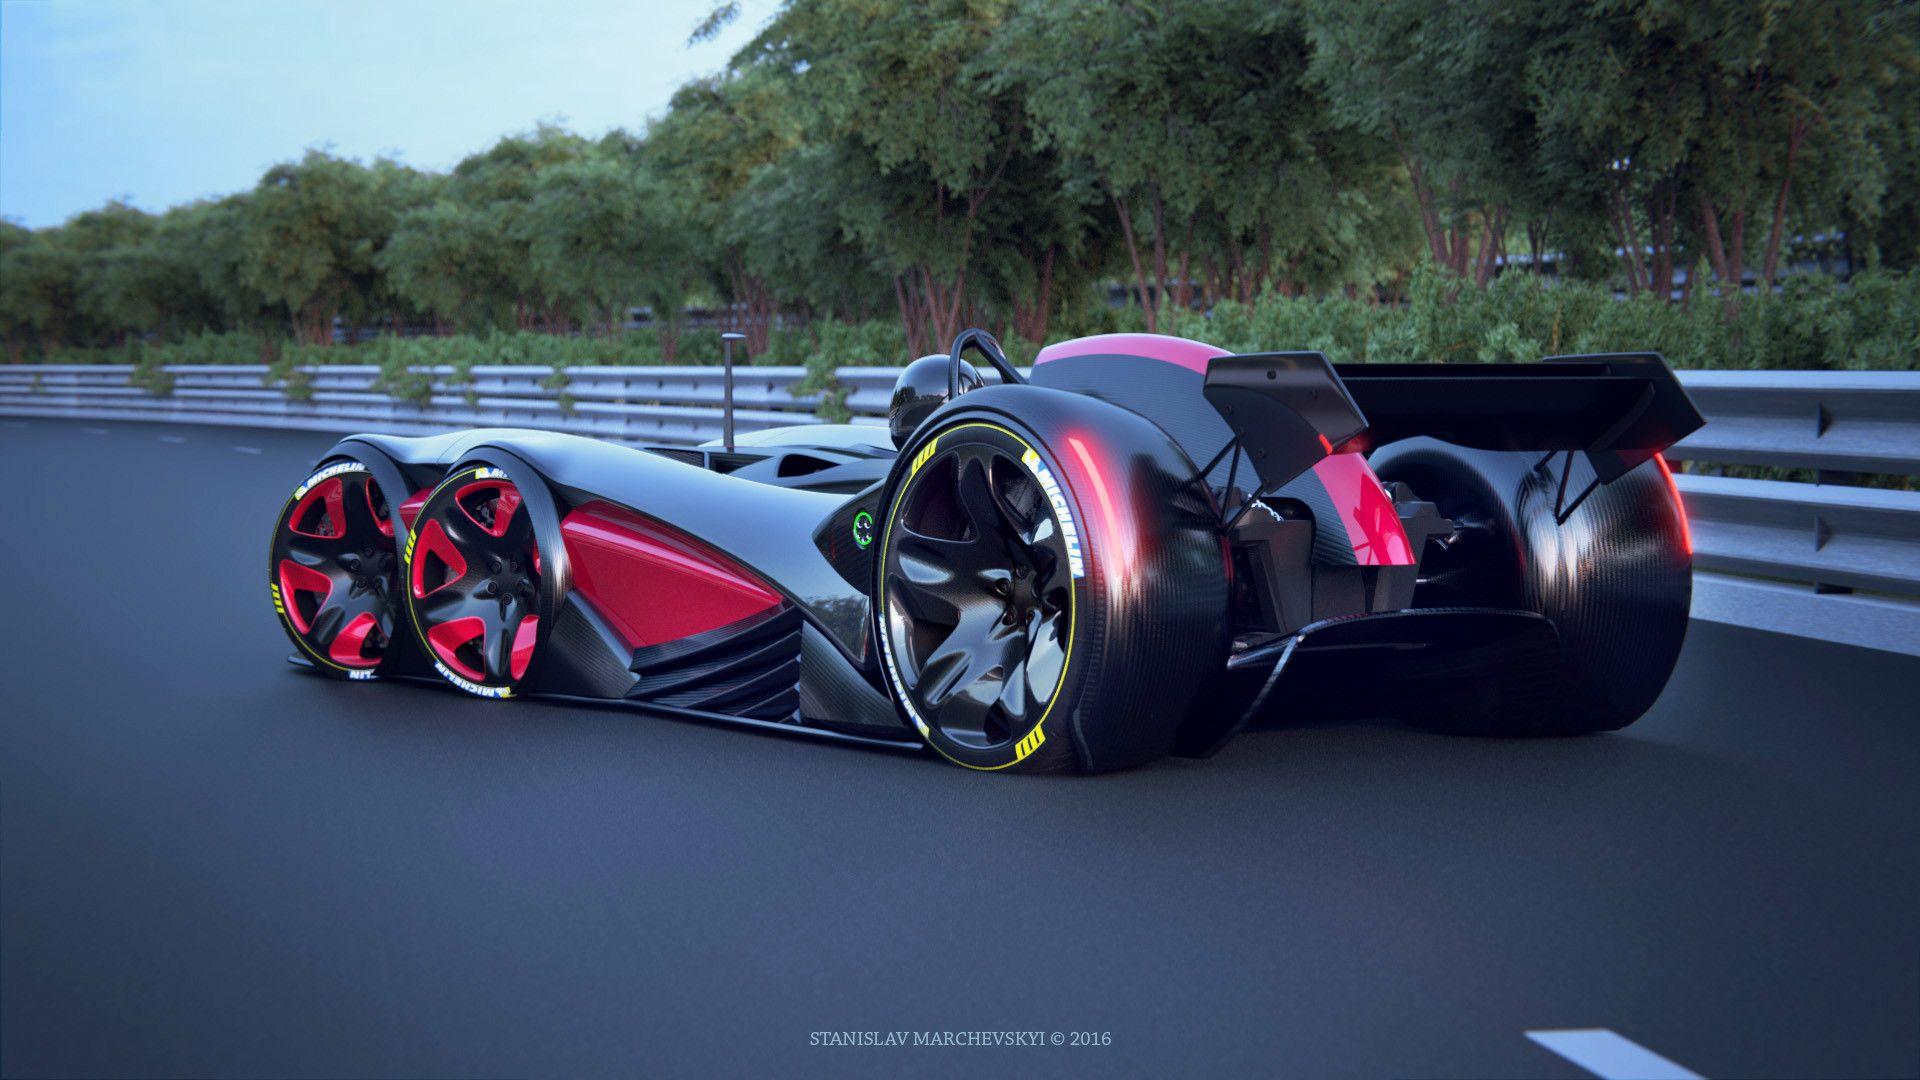 Artstation 6 Wheels Racing Car Stanislav Marchevsky Race Cars Futuristic Cars Future Concept Cars